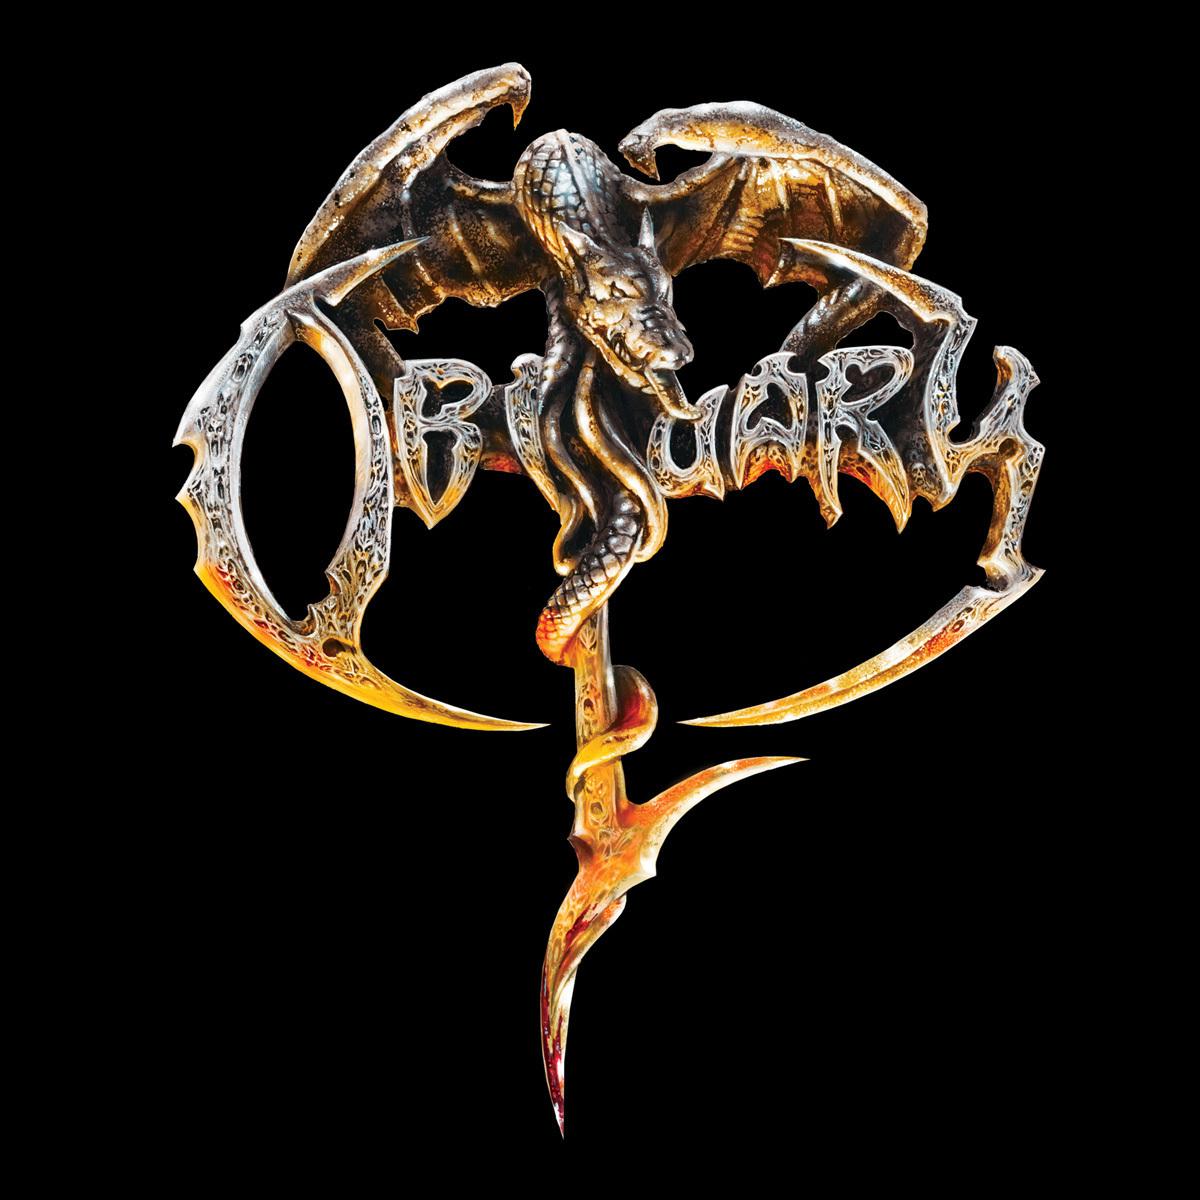 You are currently viewing Obituary'nin yeni albümünü duydun mu?